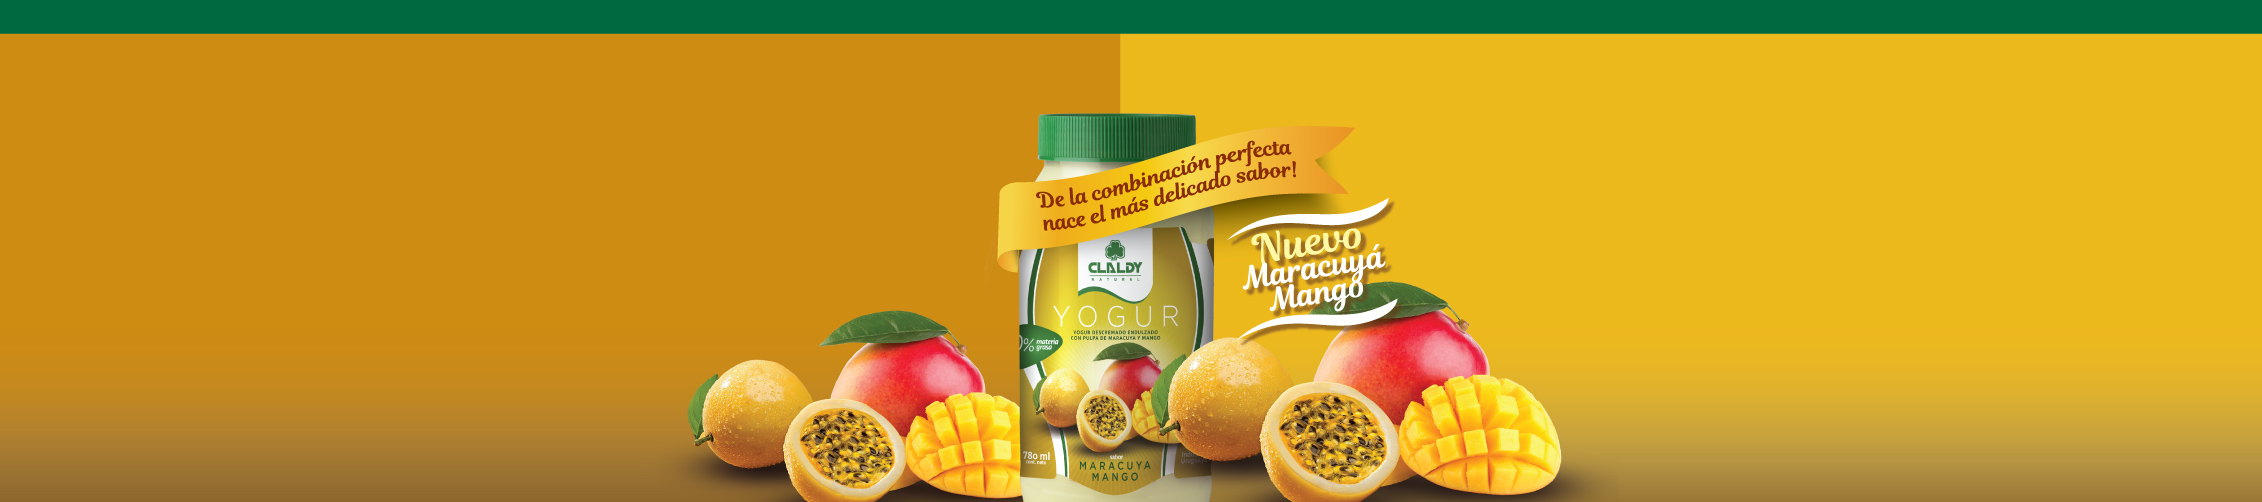 banner-web-maracuya-mango-1